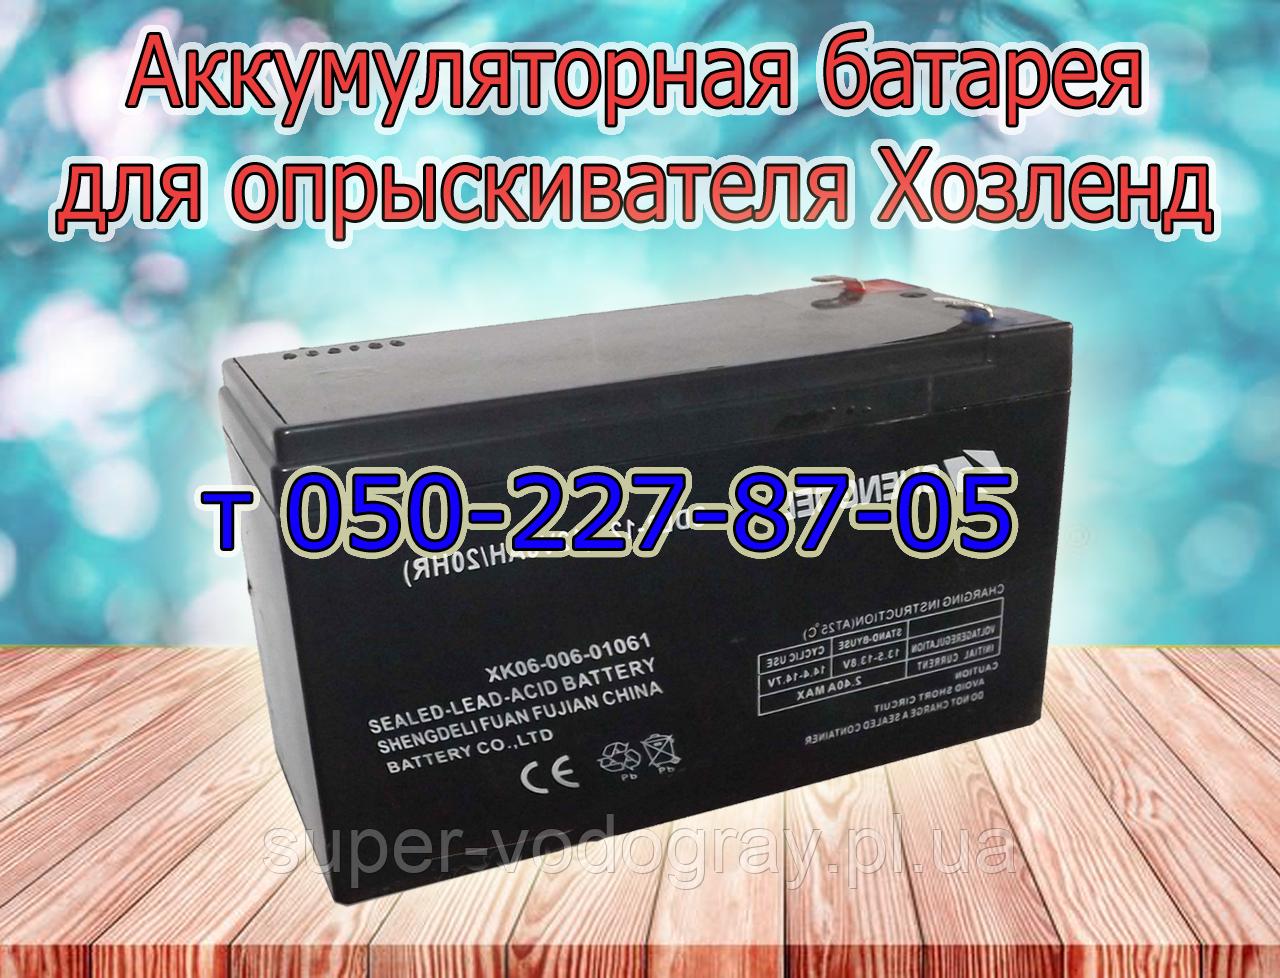 Акумуляторна батарея для обприскувача Хозленд